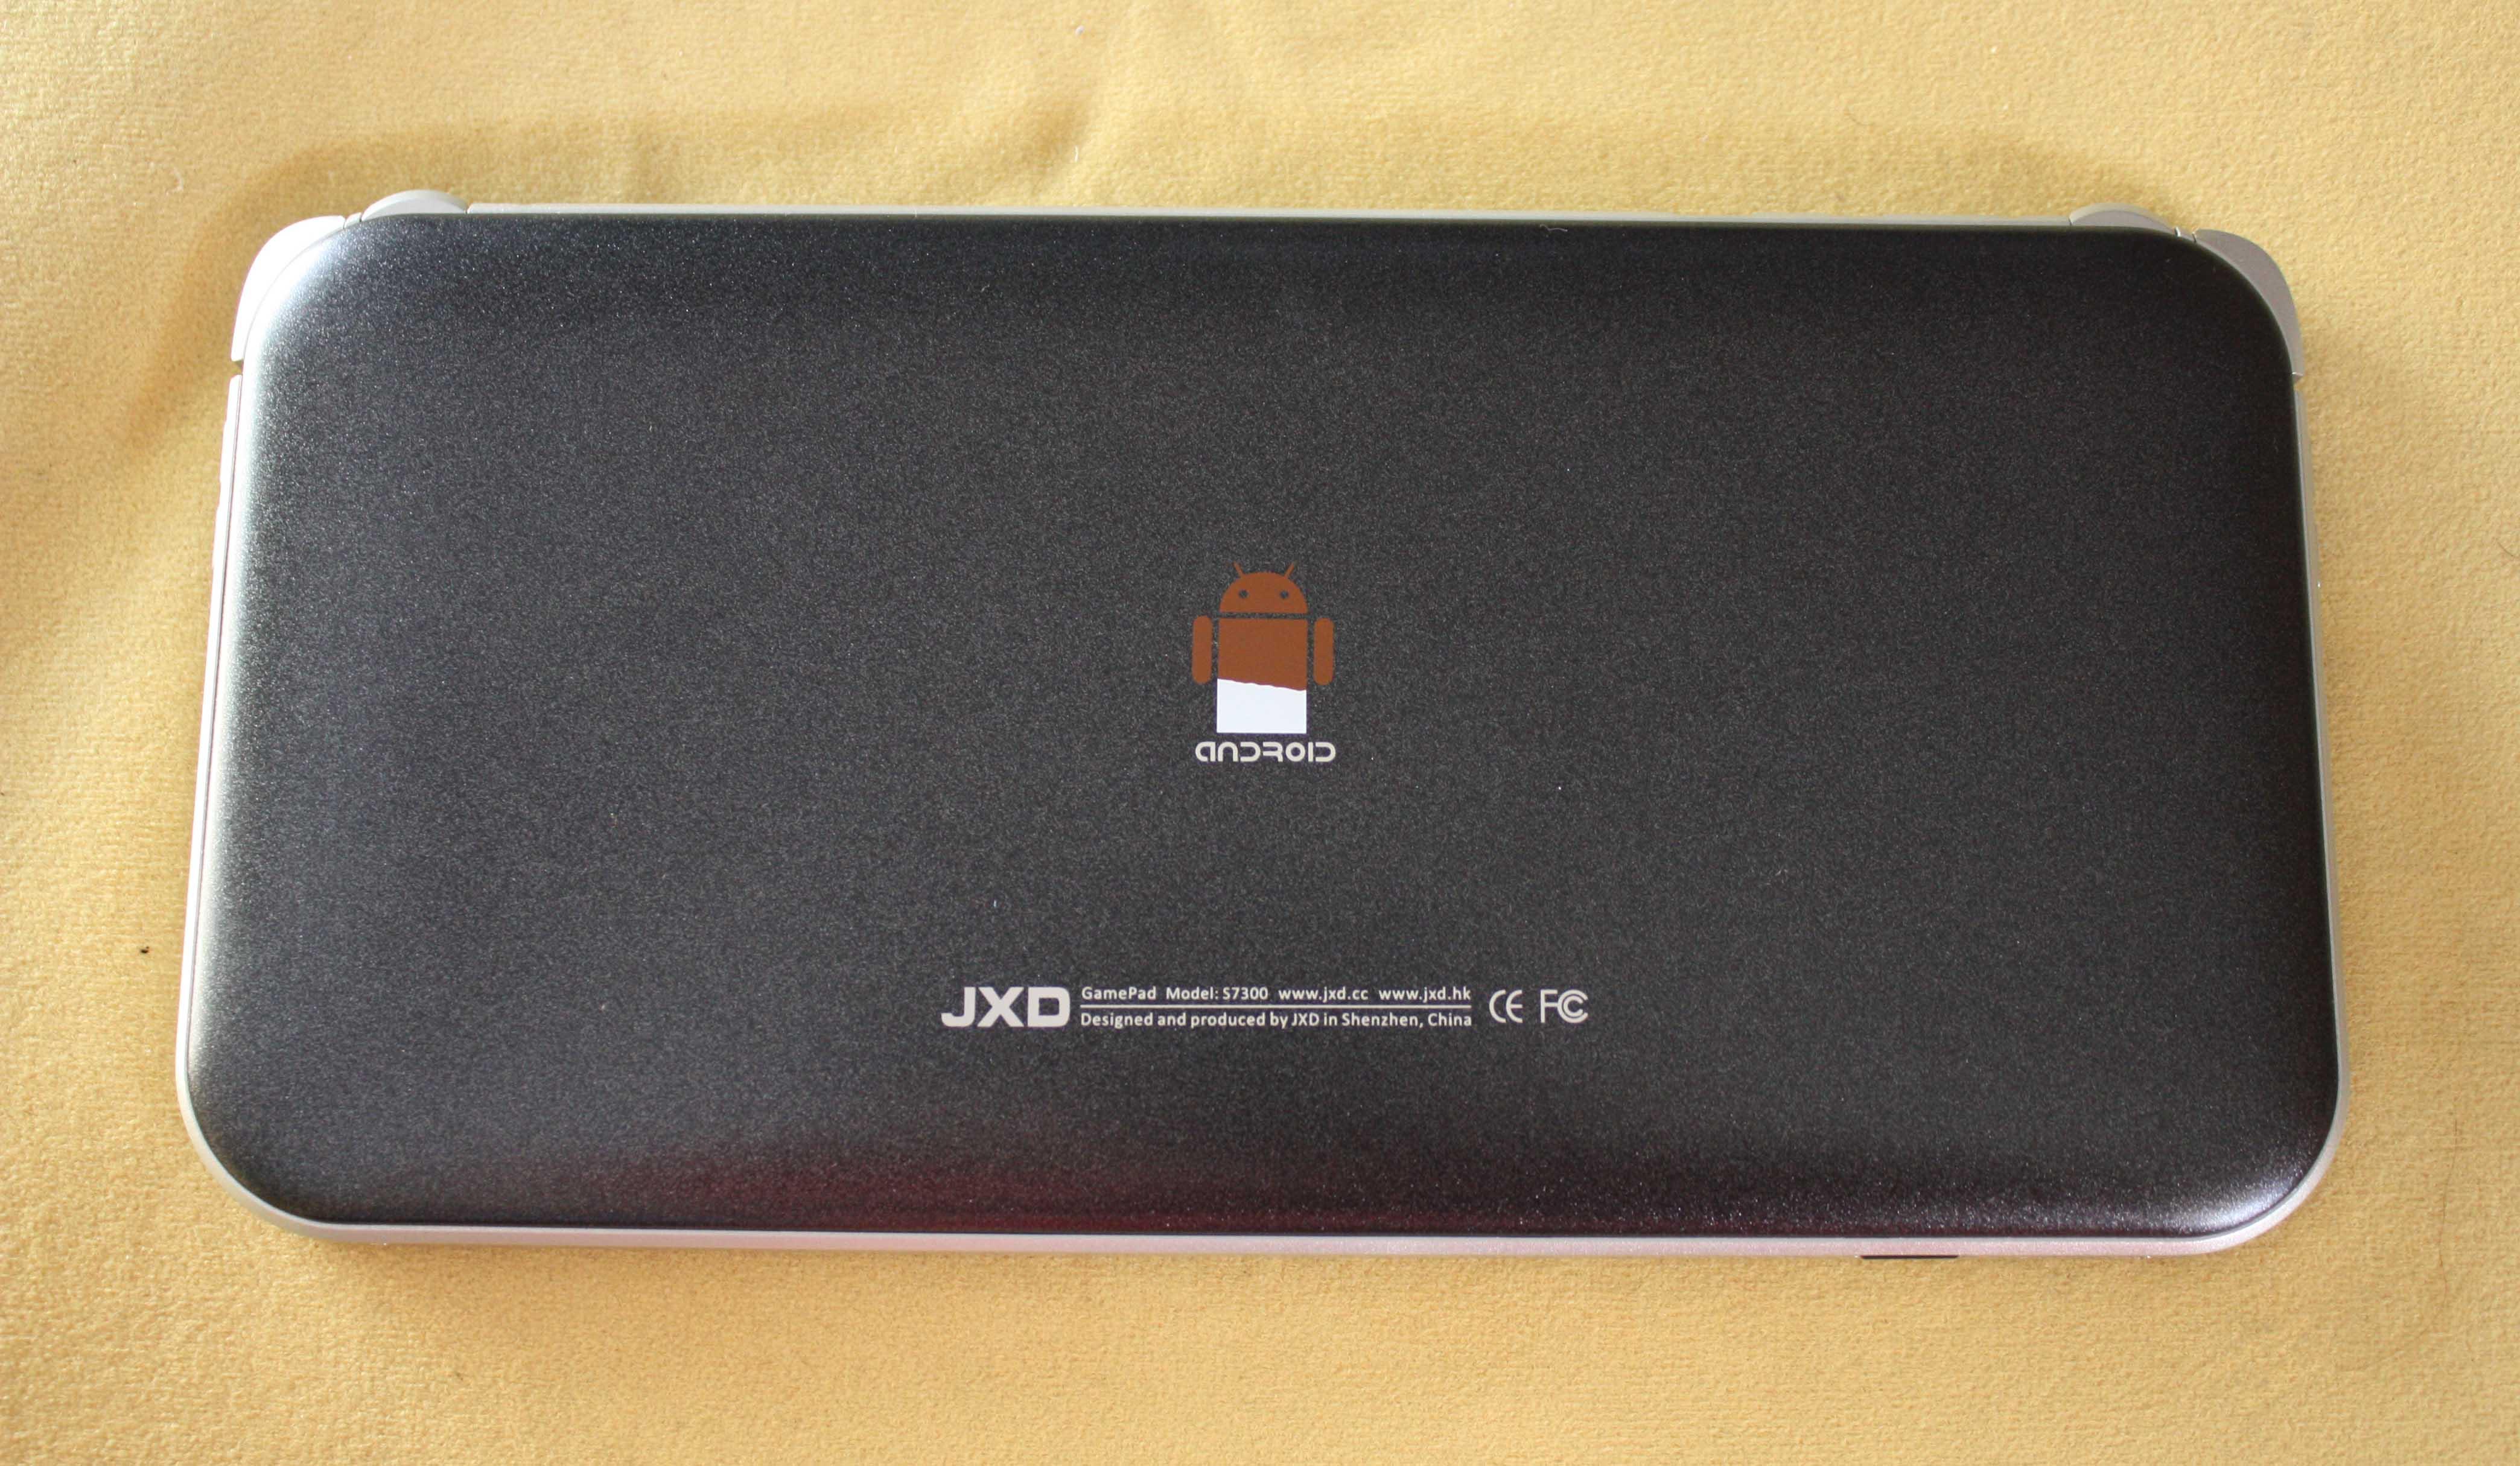 jxd s7300b posterior